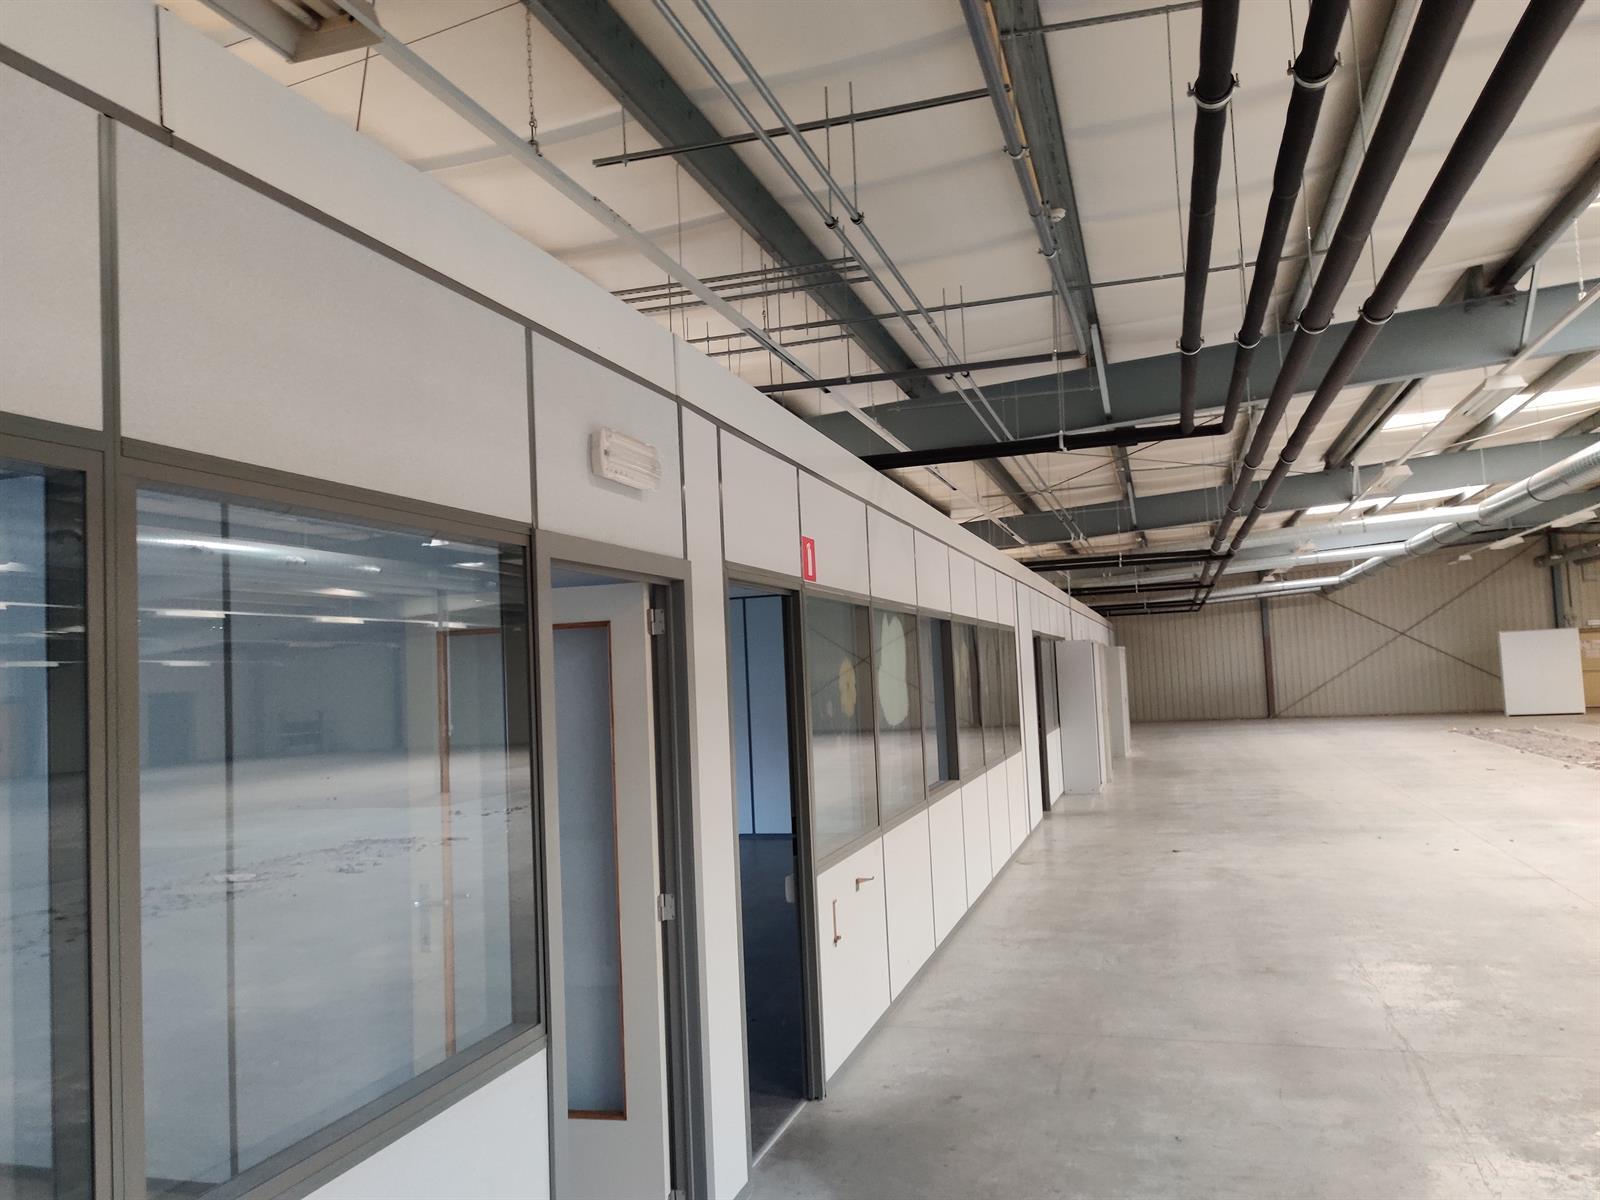 gebouw voor gemengd gebruik te huur I173 - Quatrieme Rue , 6040 Charleroi Jumet, België 28